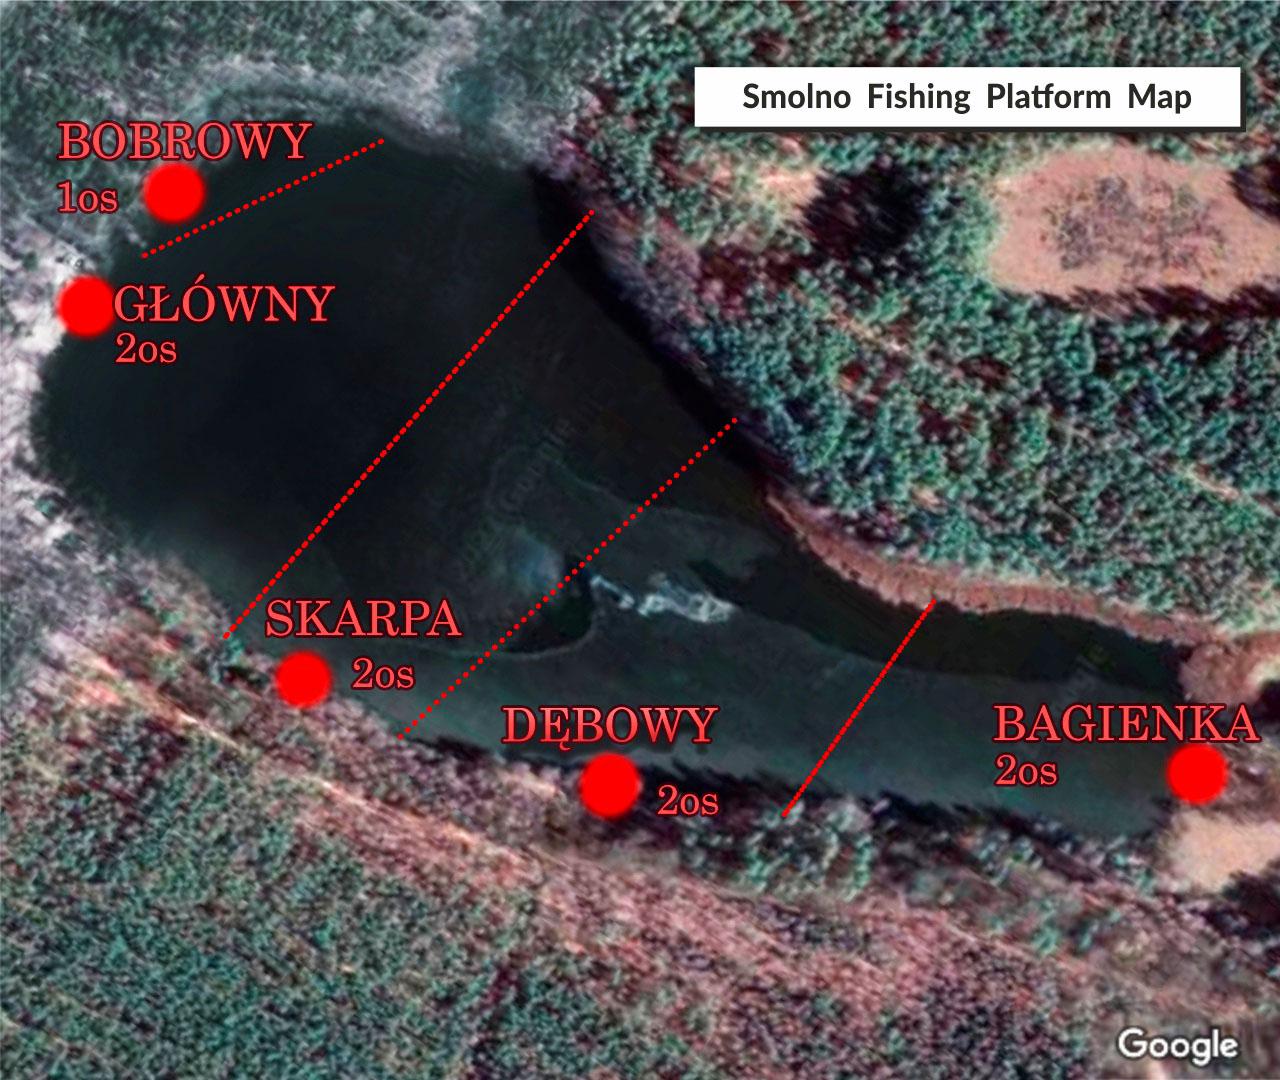 Smolno fishing platform map